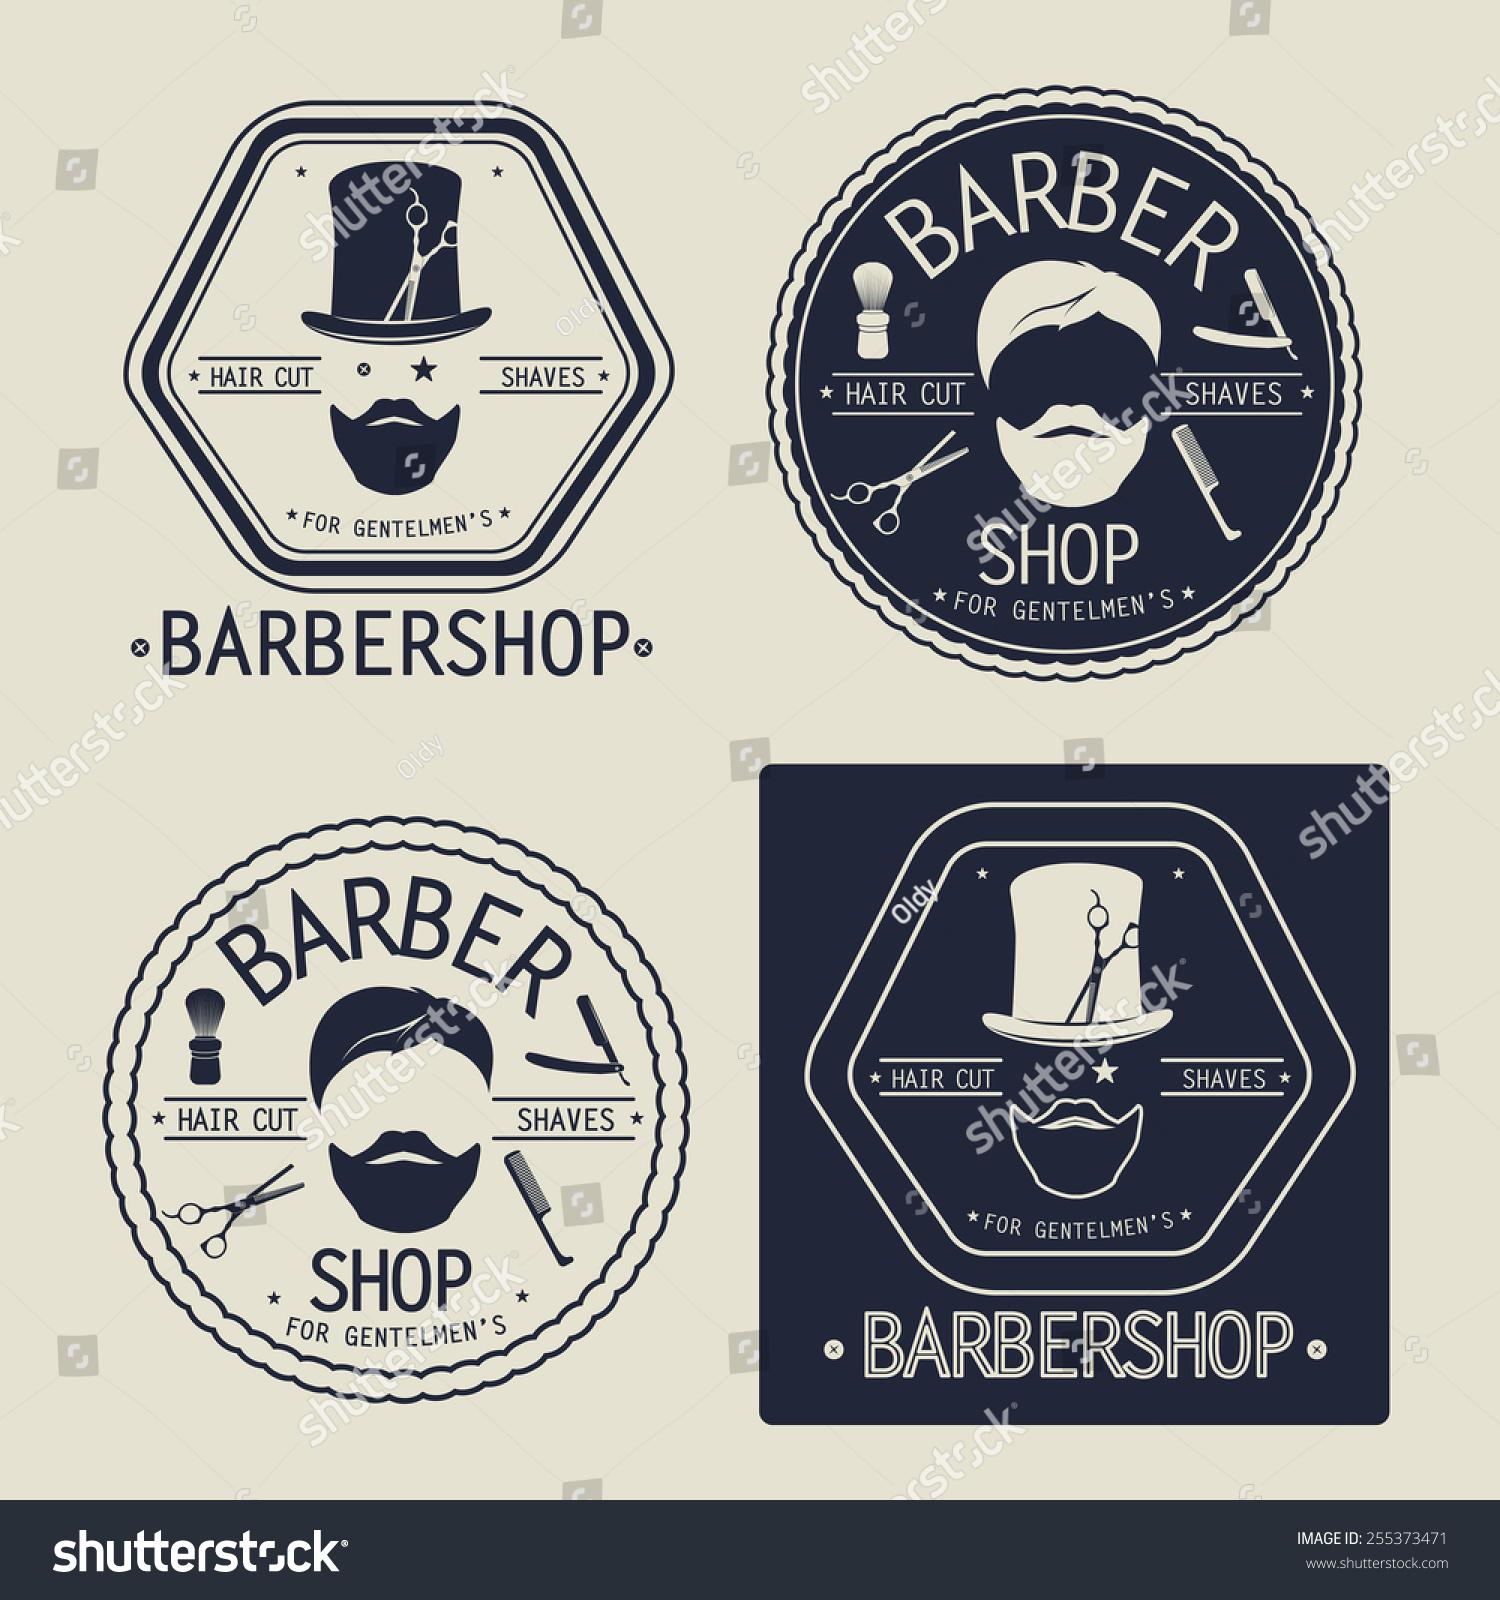 Free Vintage Barber Shop Logo Templates PSD  Freebies